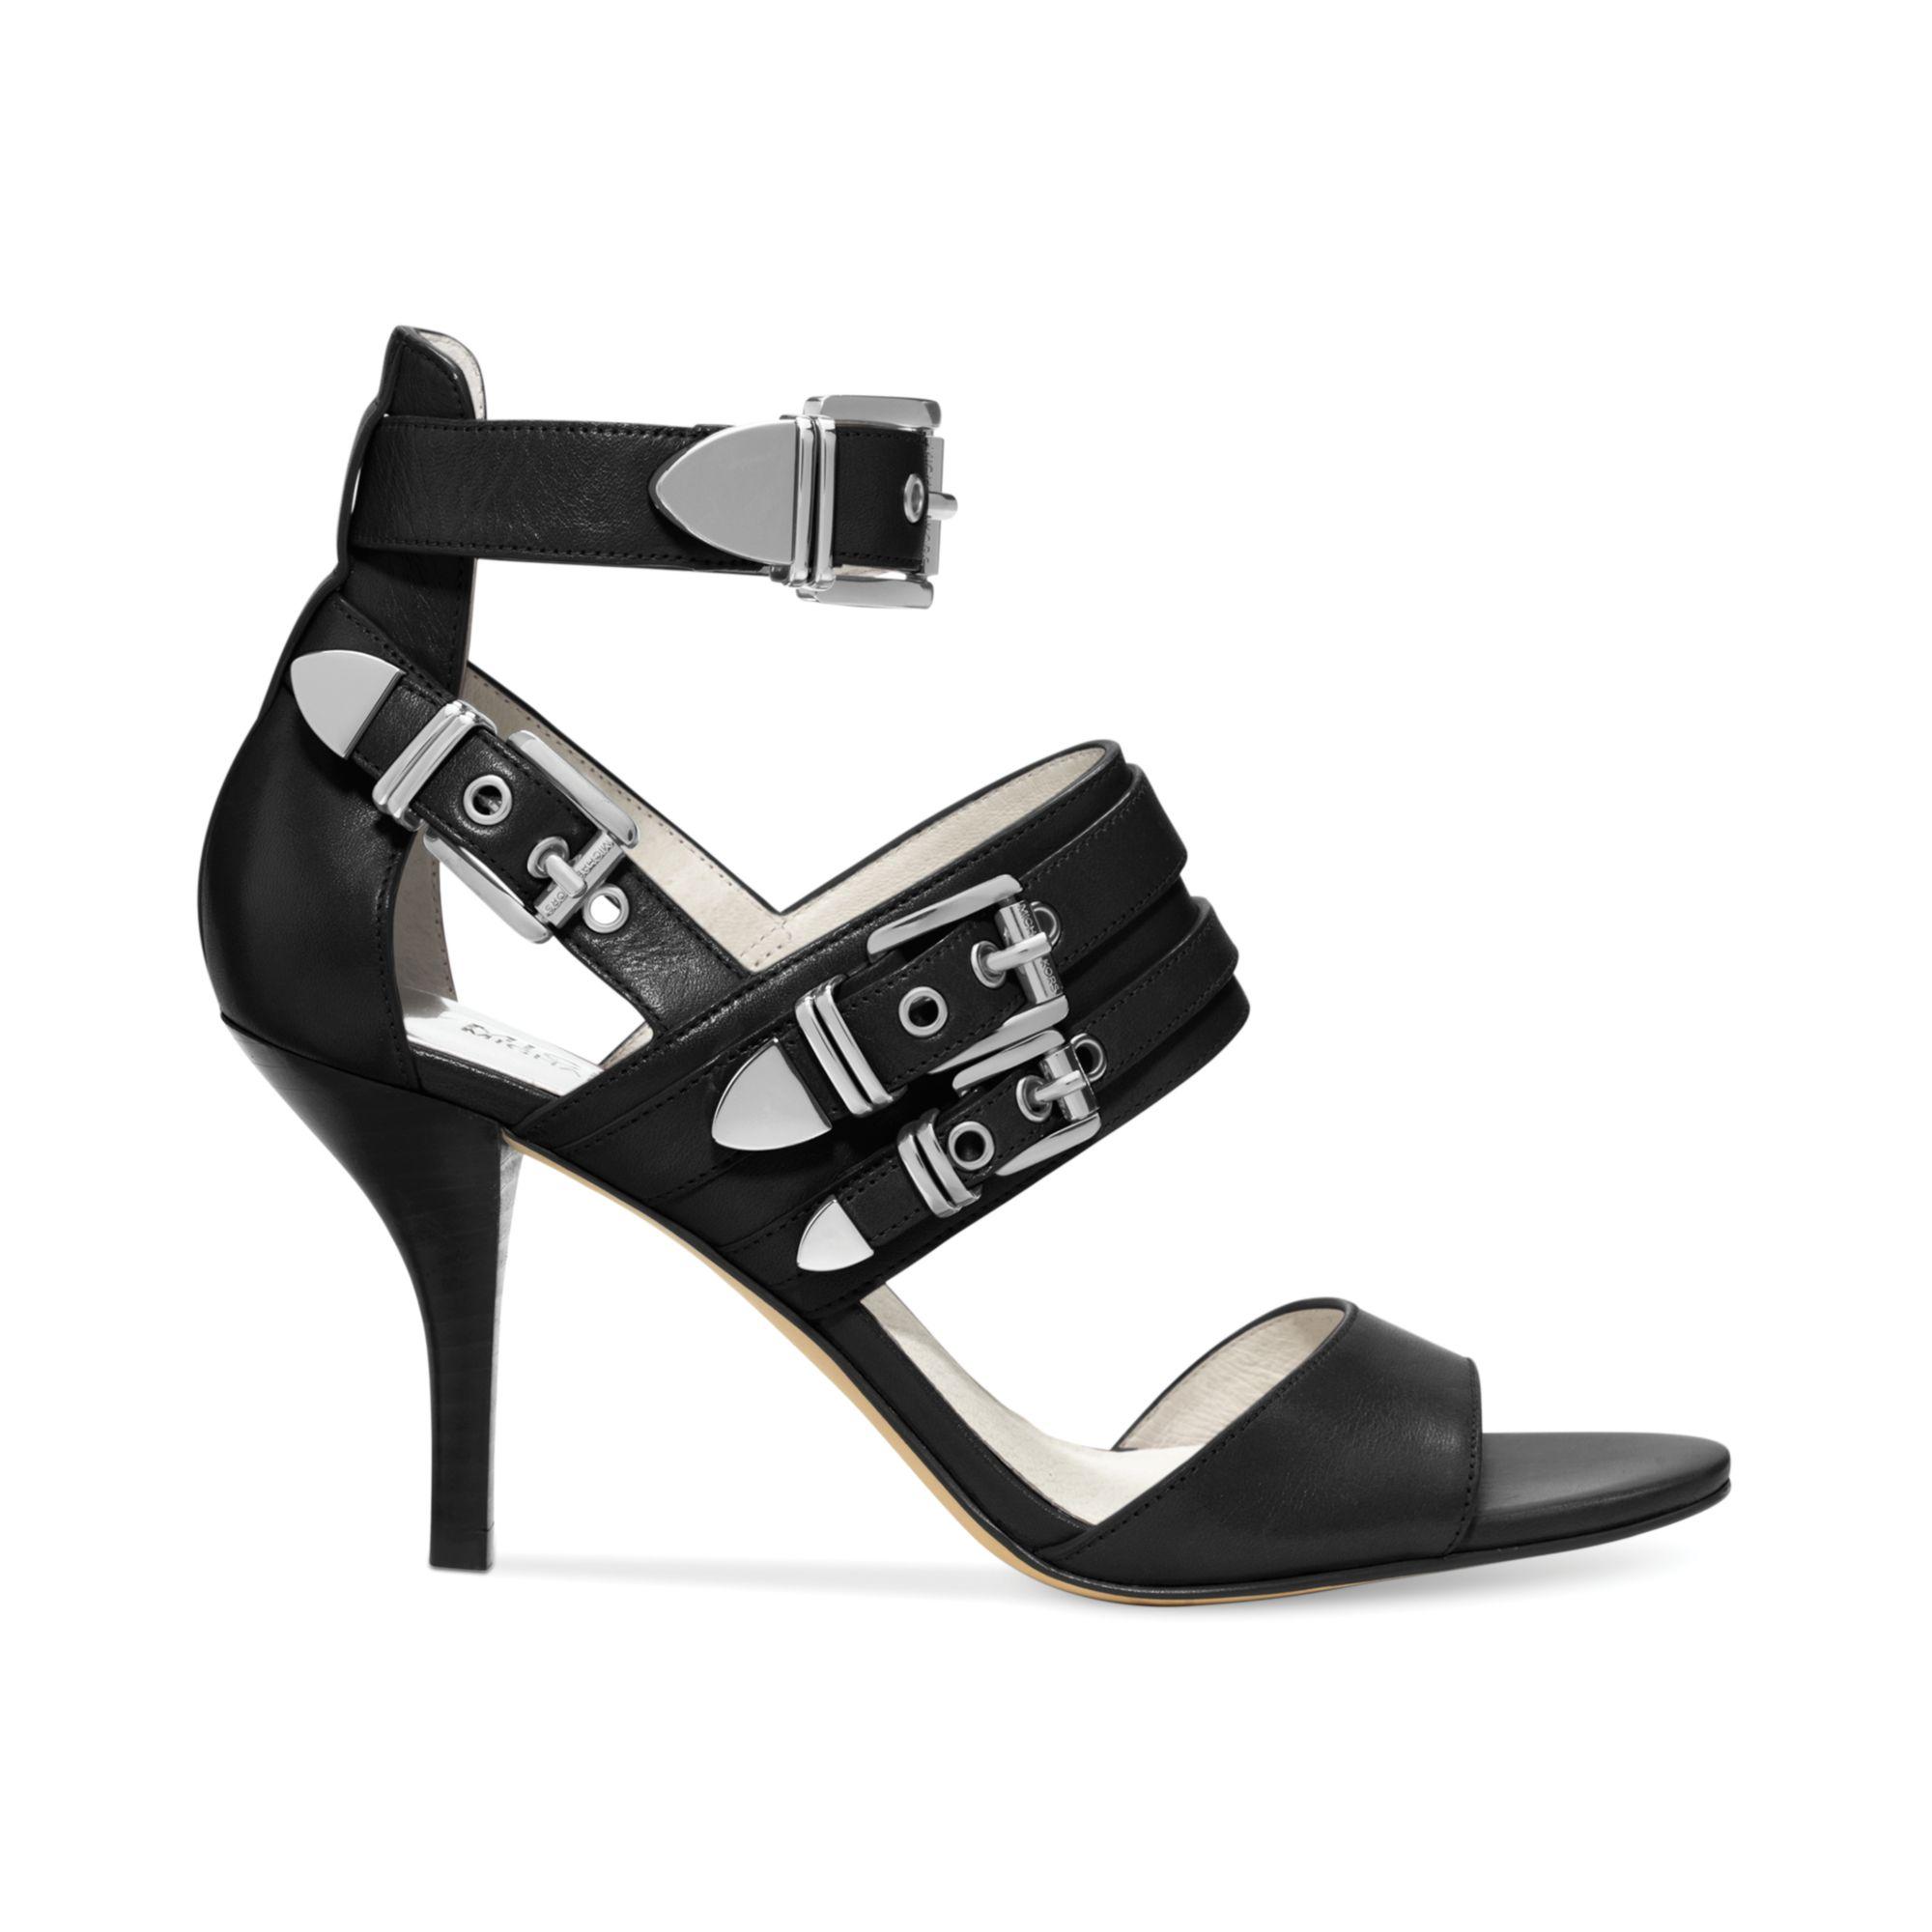 48bf07e3850d Lyst - Michael Kors Michael Cassie Mid Heel Sandals in Black